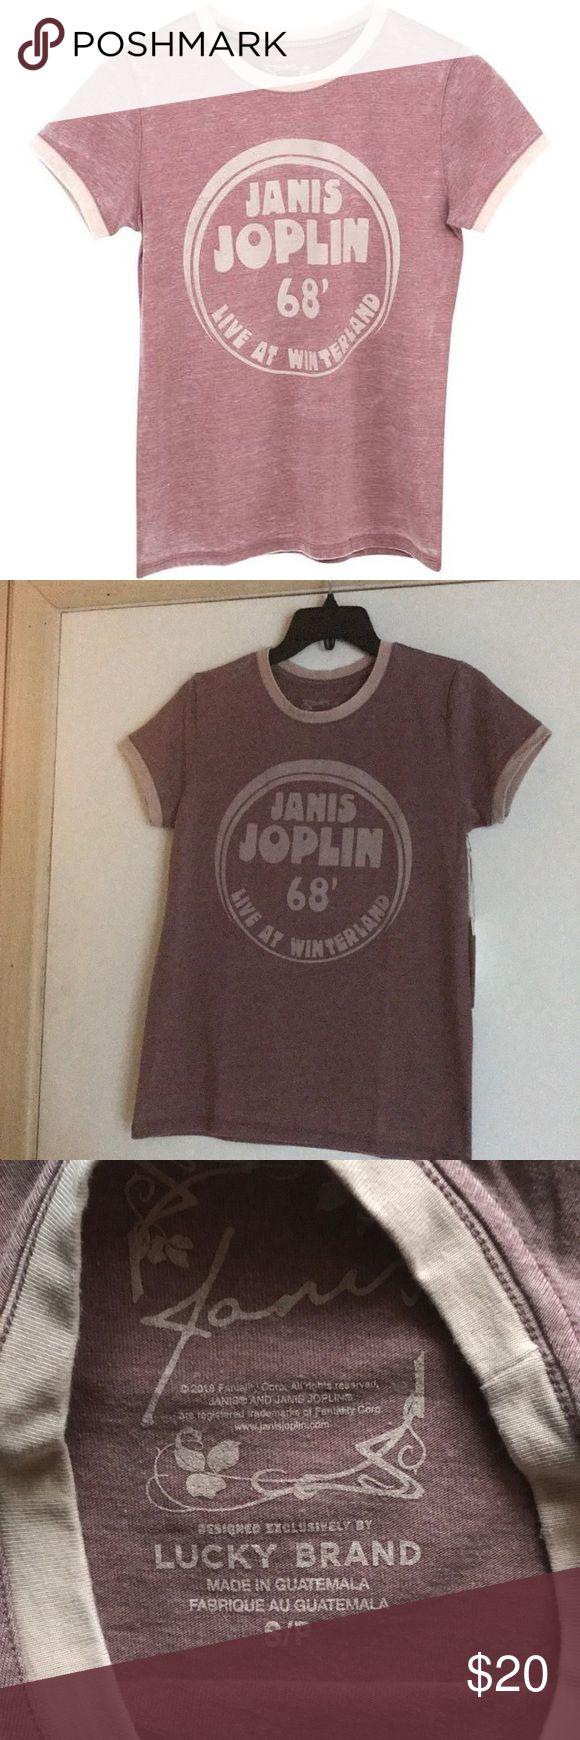 NEW Graphic Janis Joplin 68' Winterland T-shirt Approx 24 ...